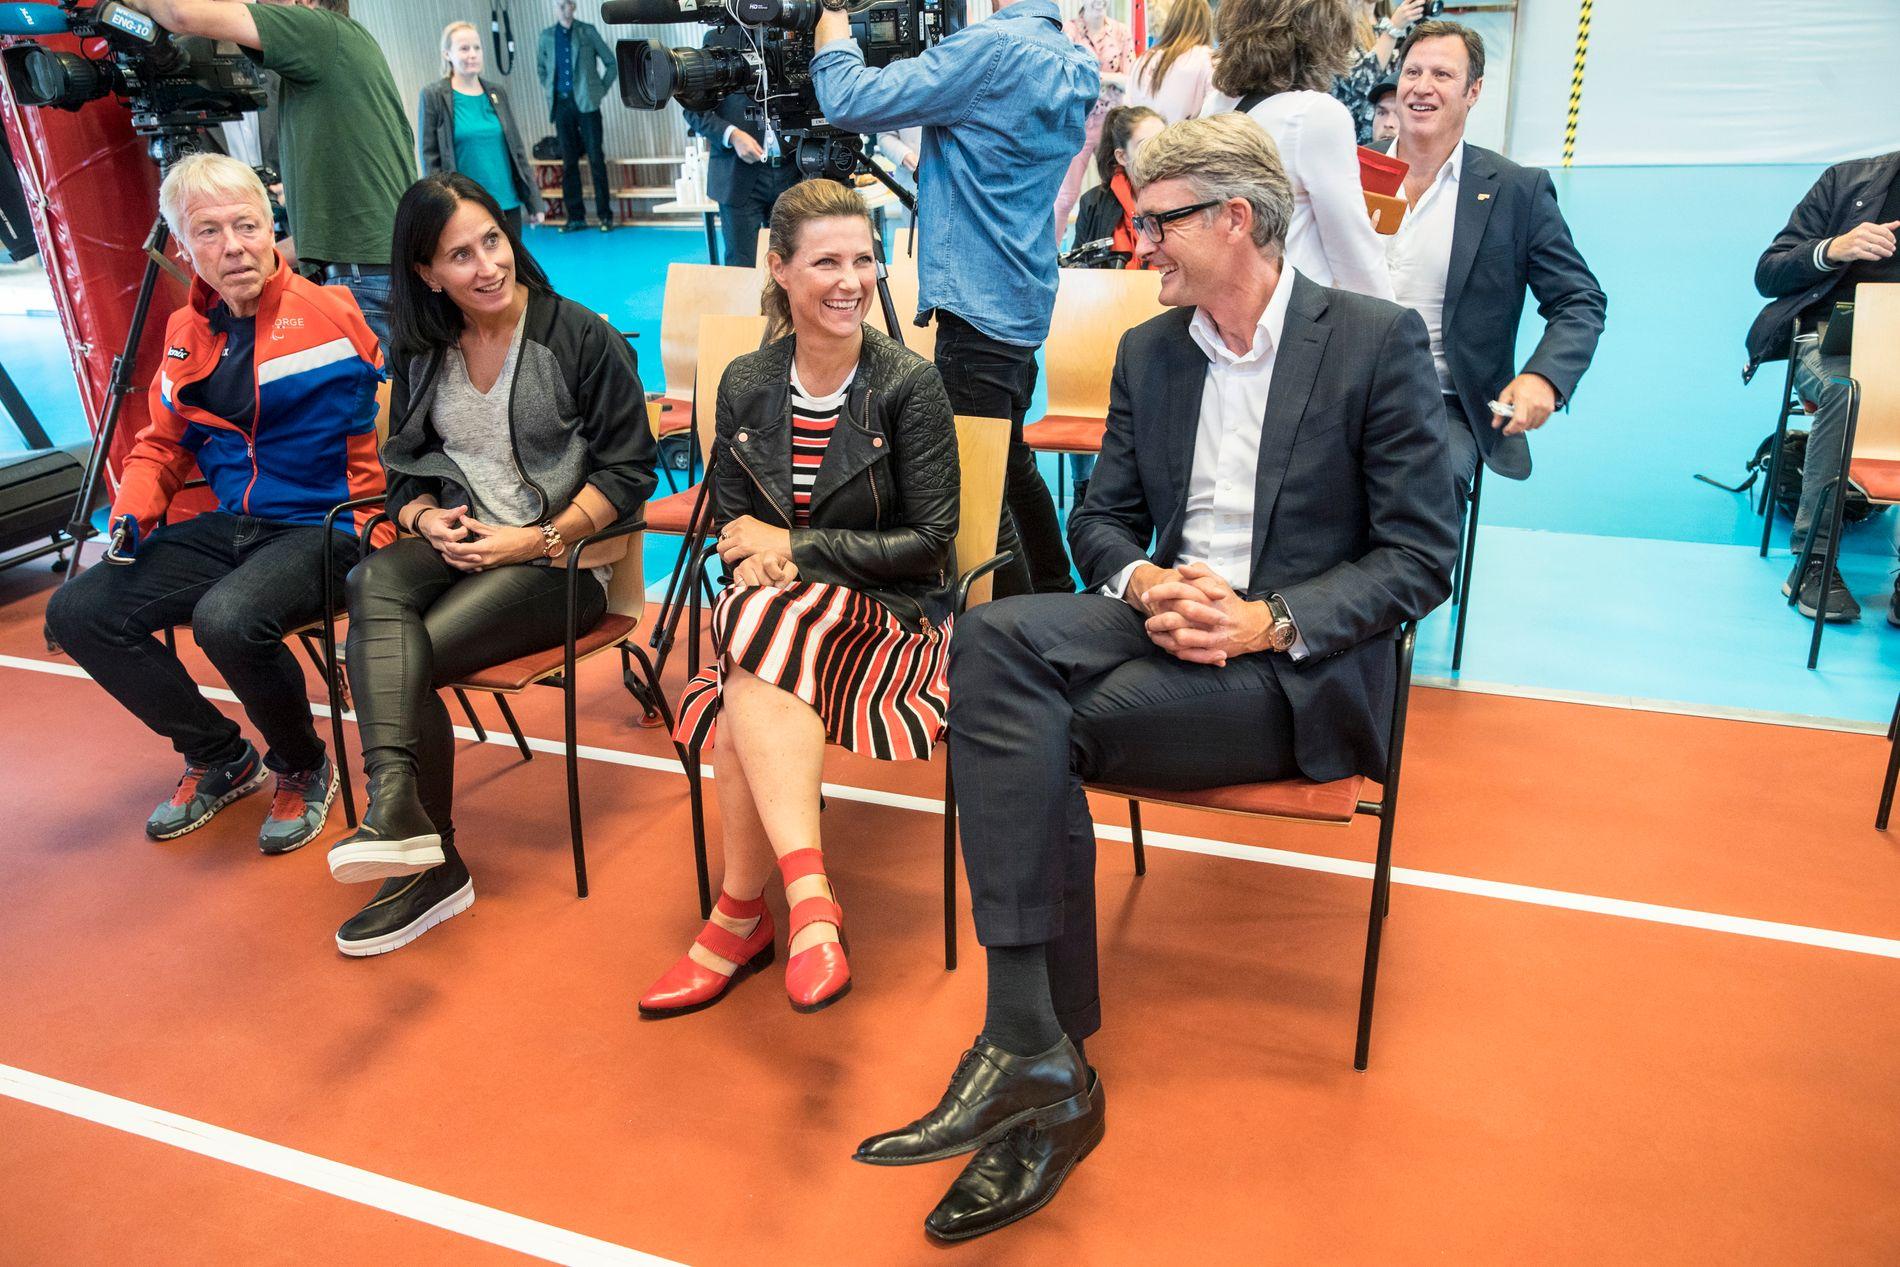 GOD STEMNING: Cato Zahl Pedersen (fra venstre), Marit Bjørgen, prinsesse Märtha Louise og Aker-sjef Øyvind Eriksen.